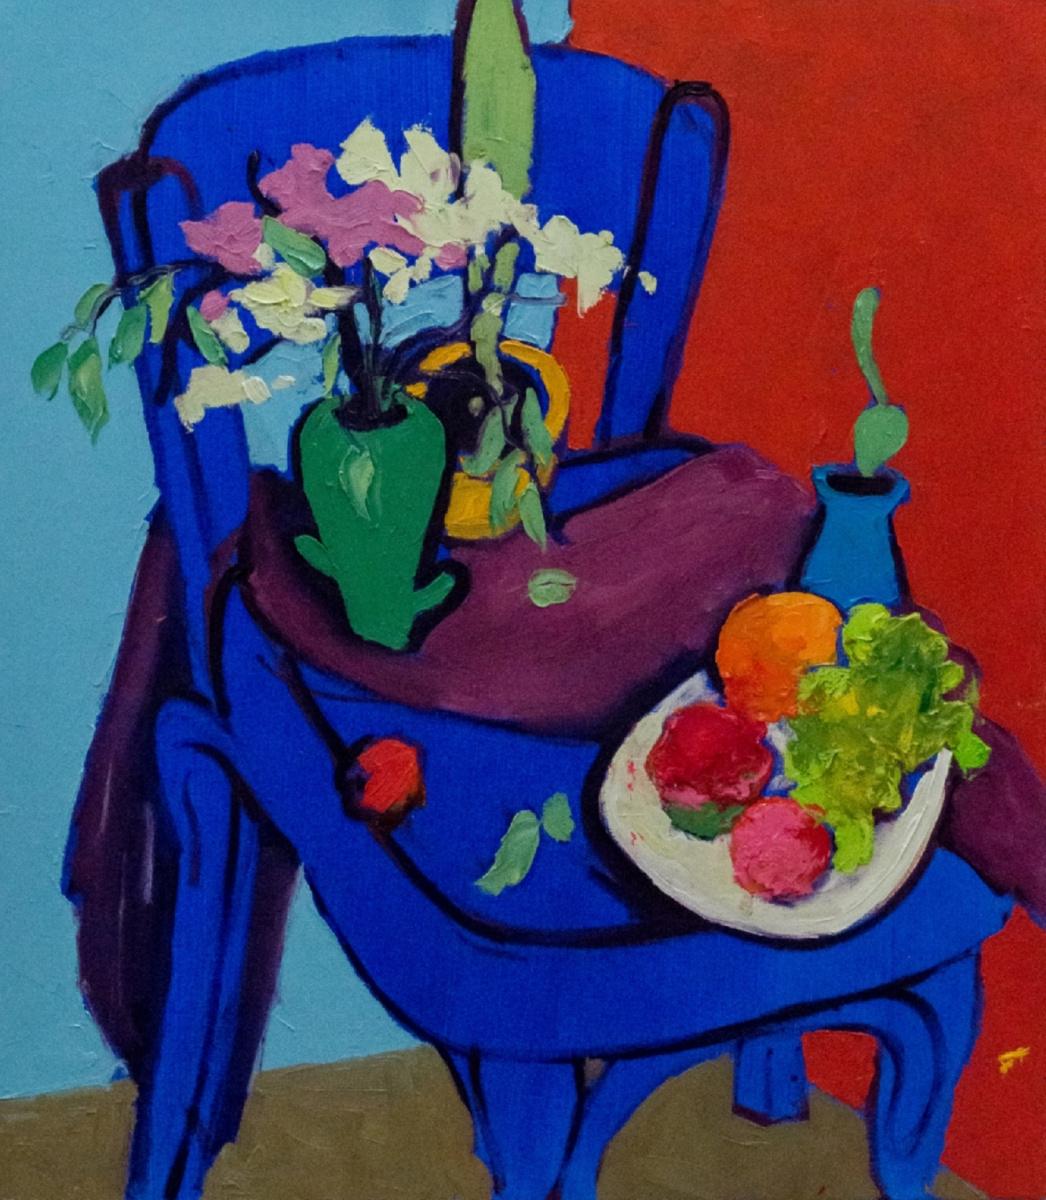 Angelina Gafinie. Still life on a blue chair